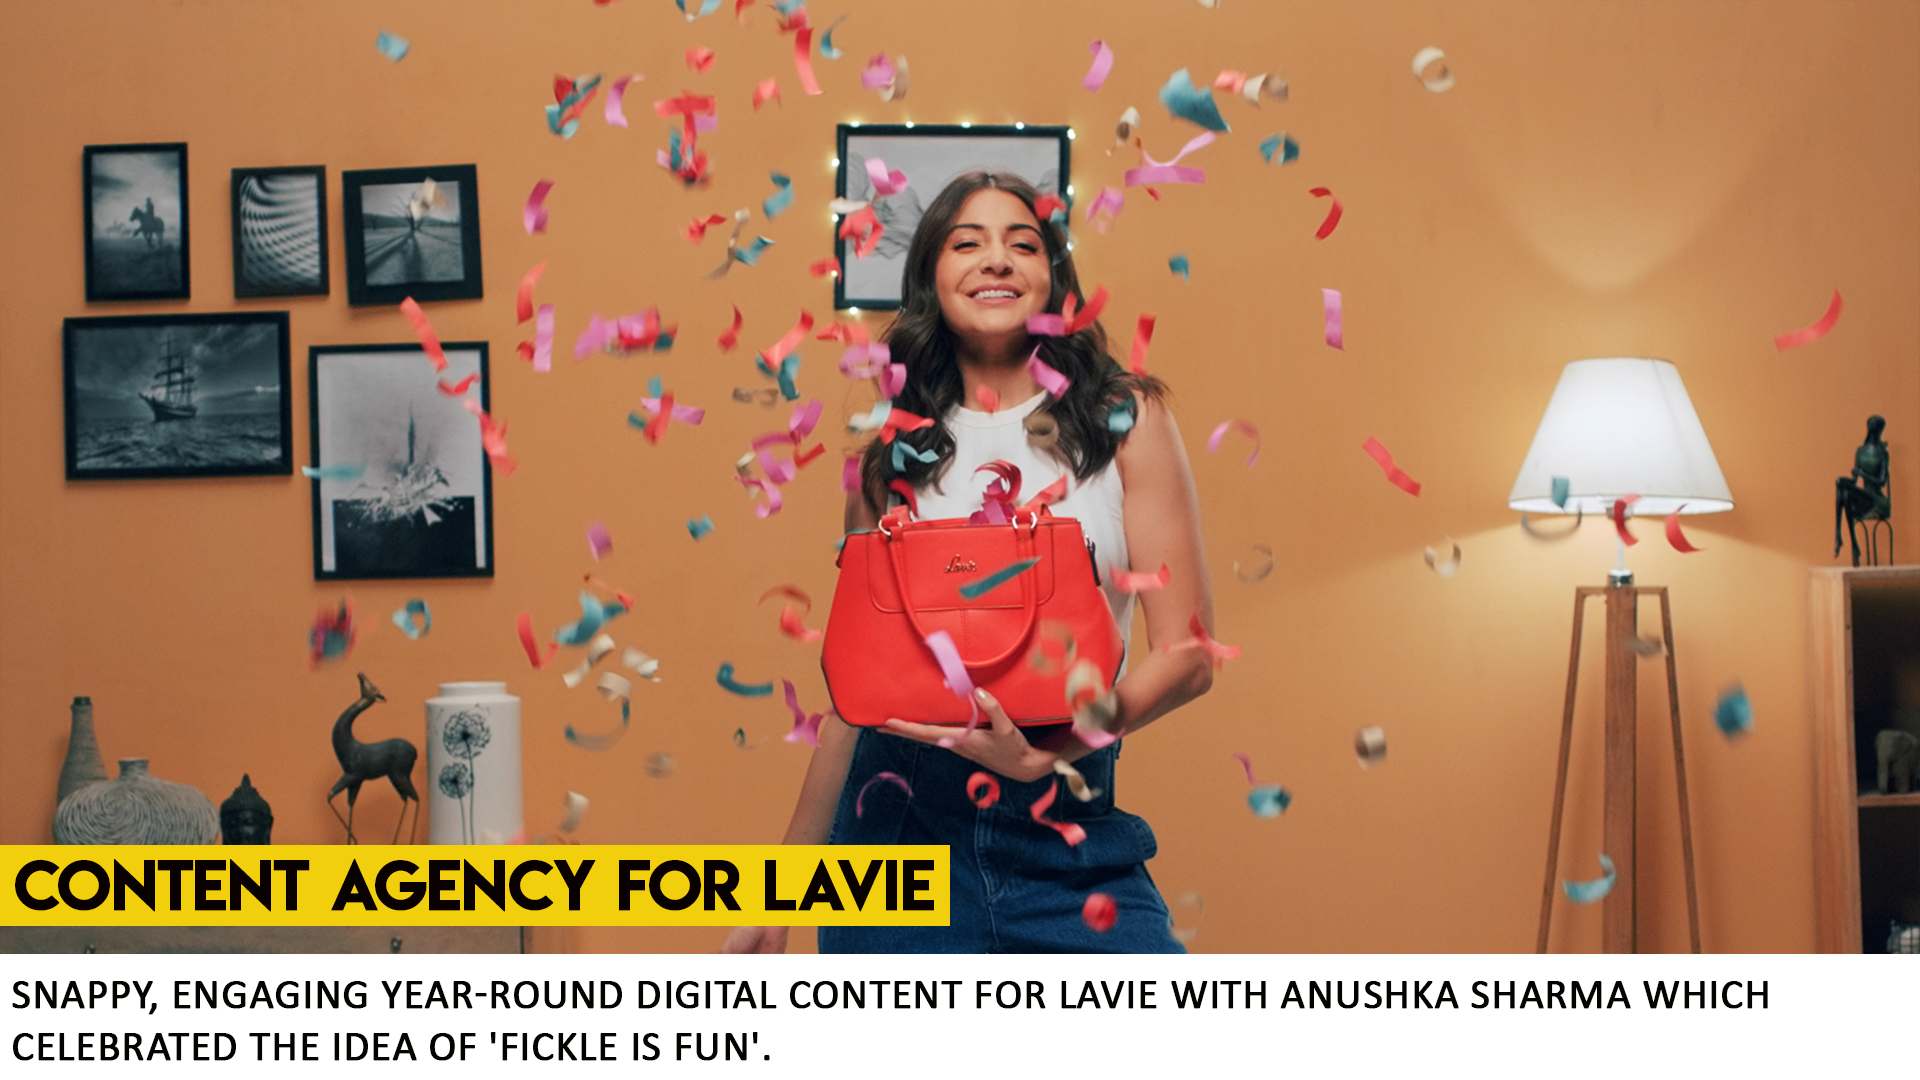 Lavie Content Agency